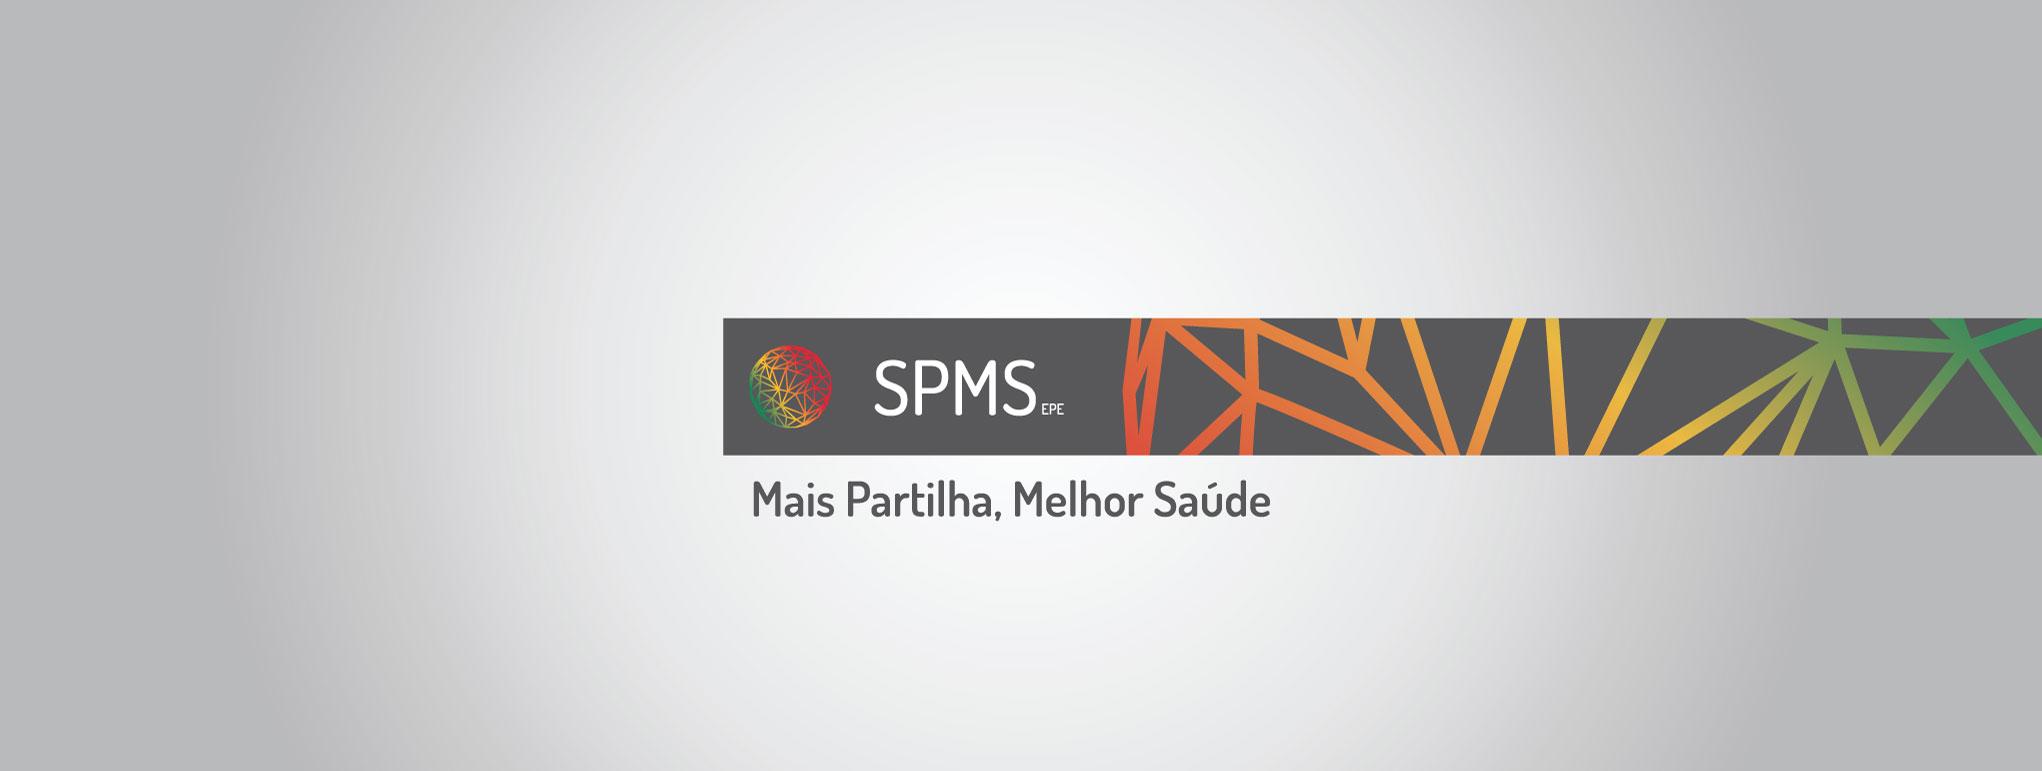 banner genérico SPMS